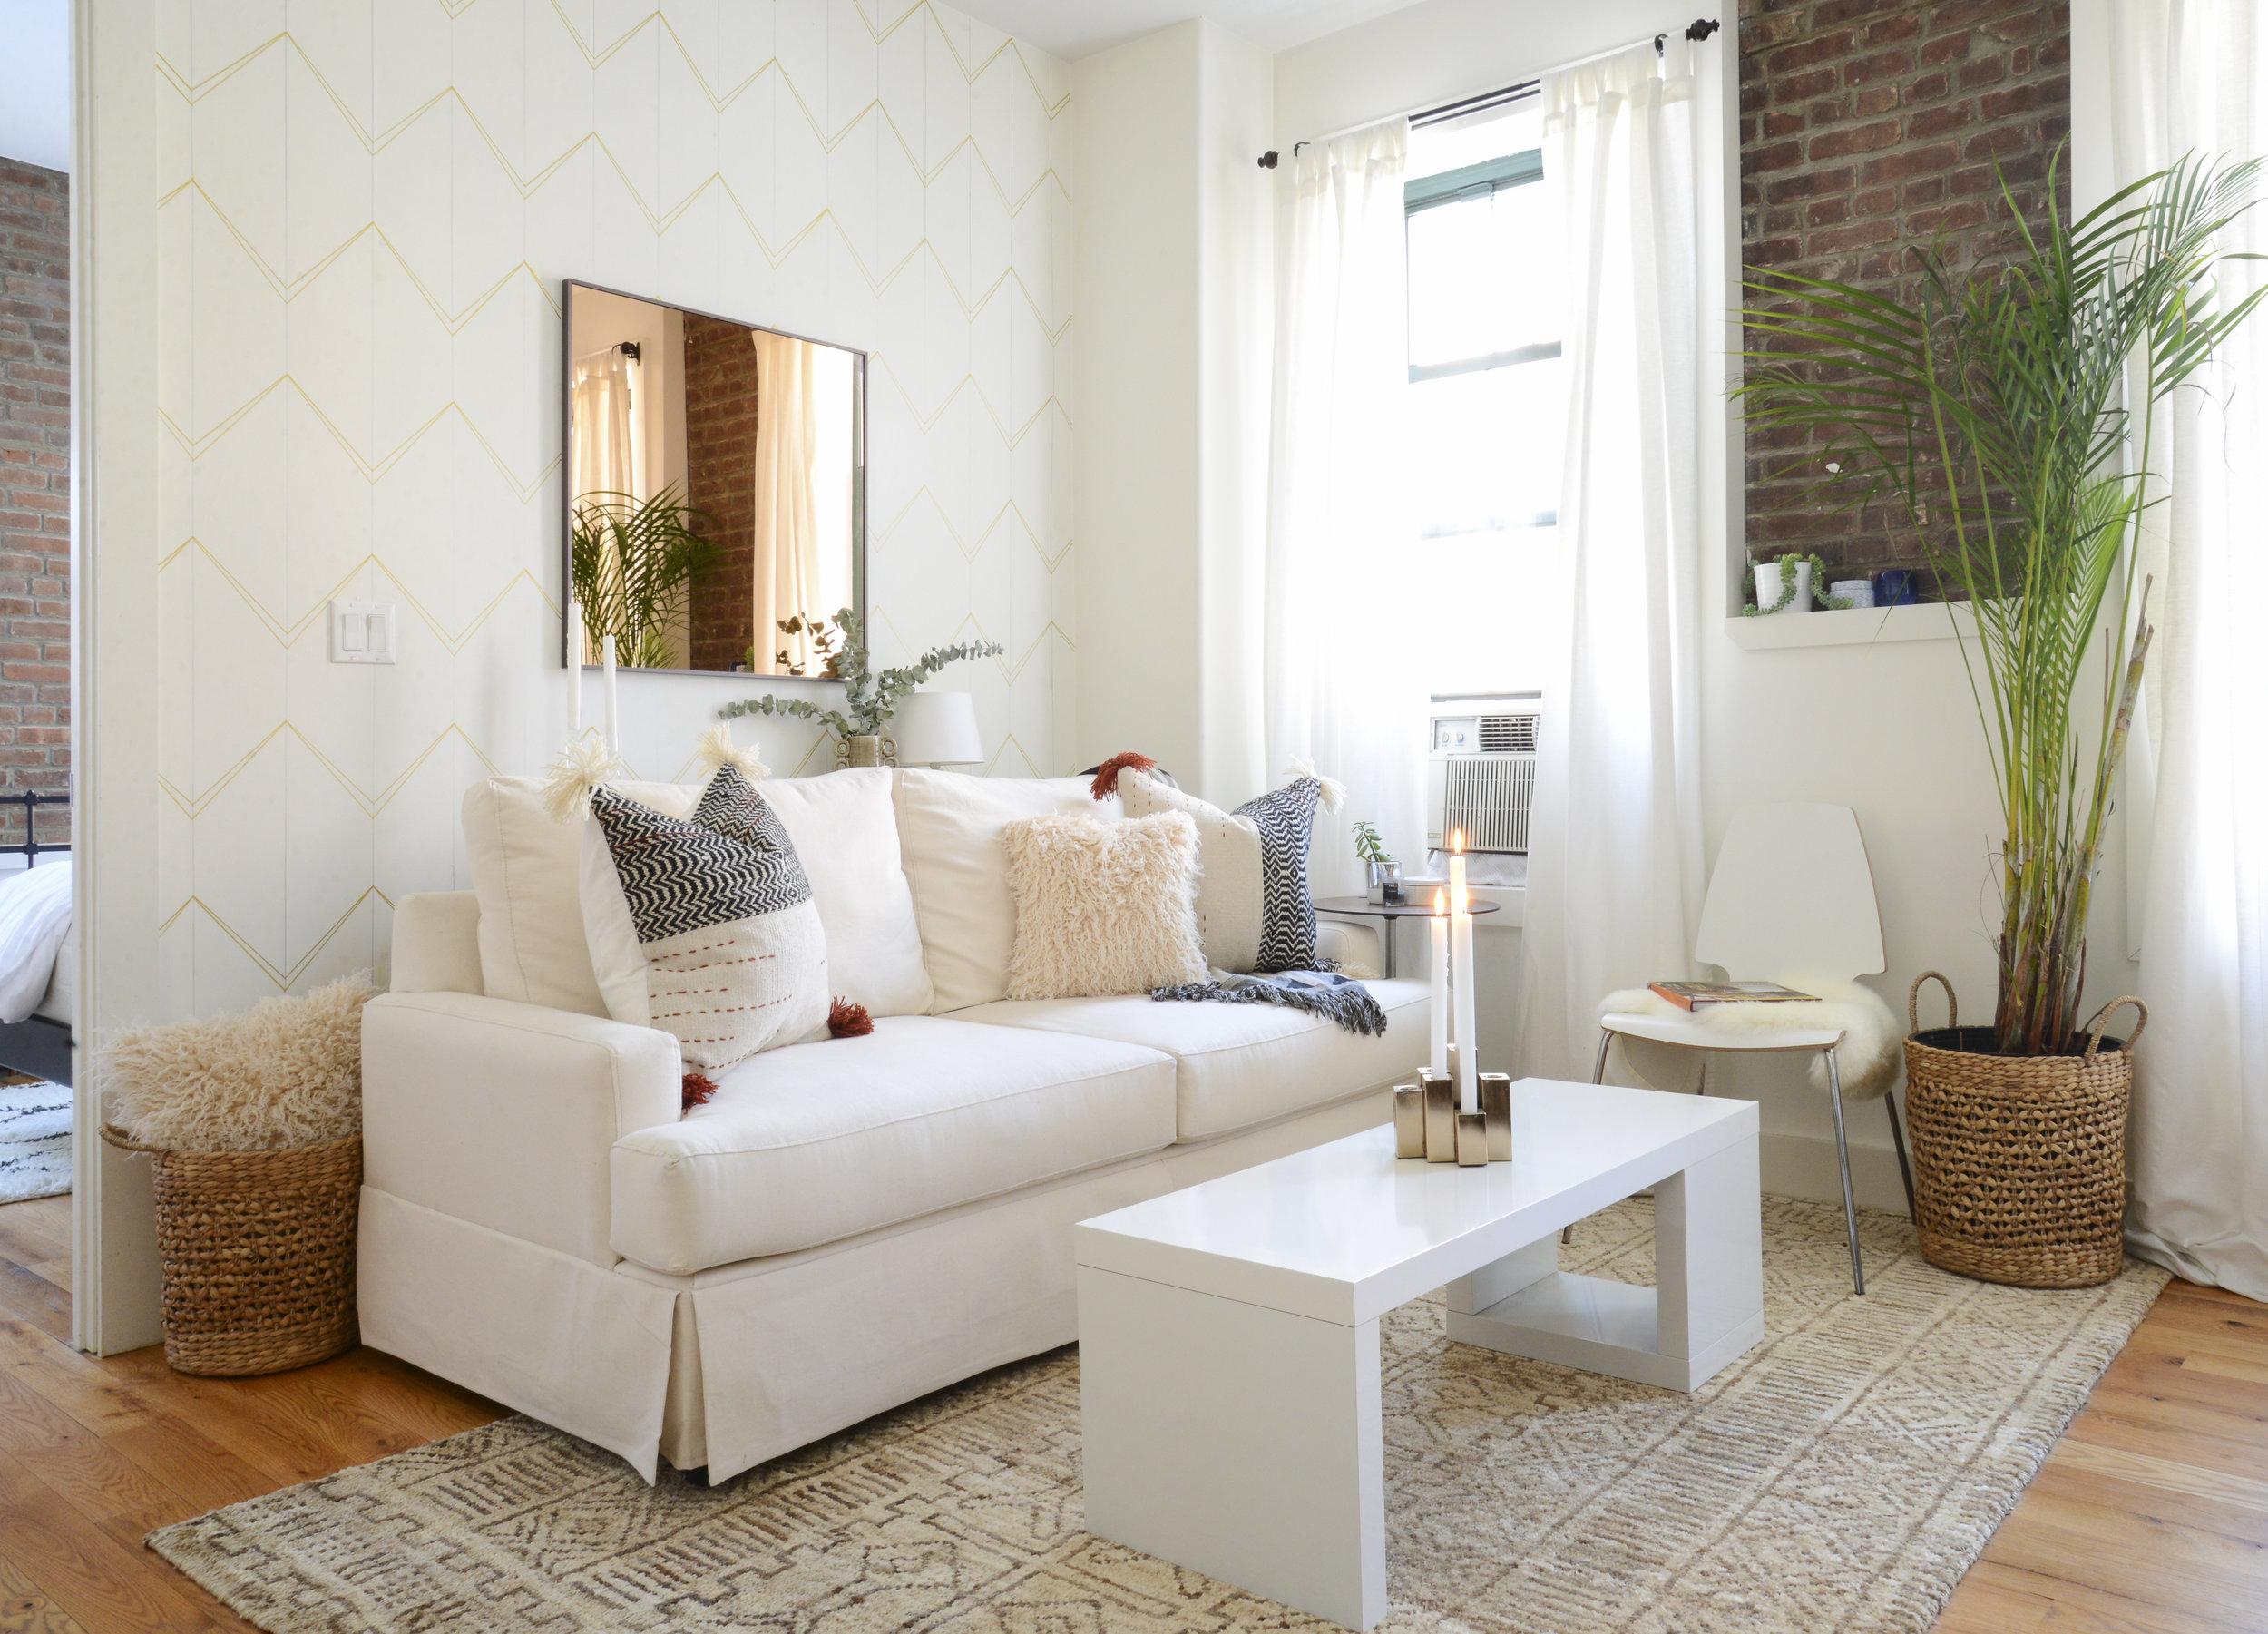 Brooklyn apartment - BEFORE